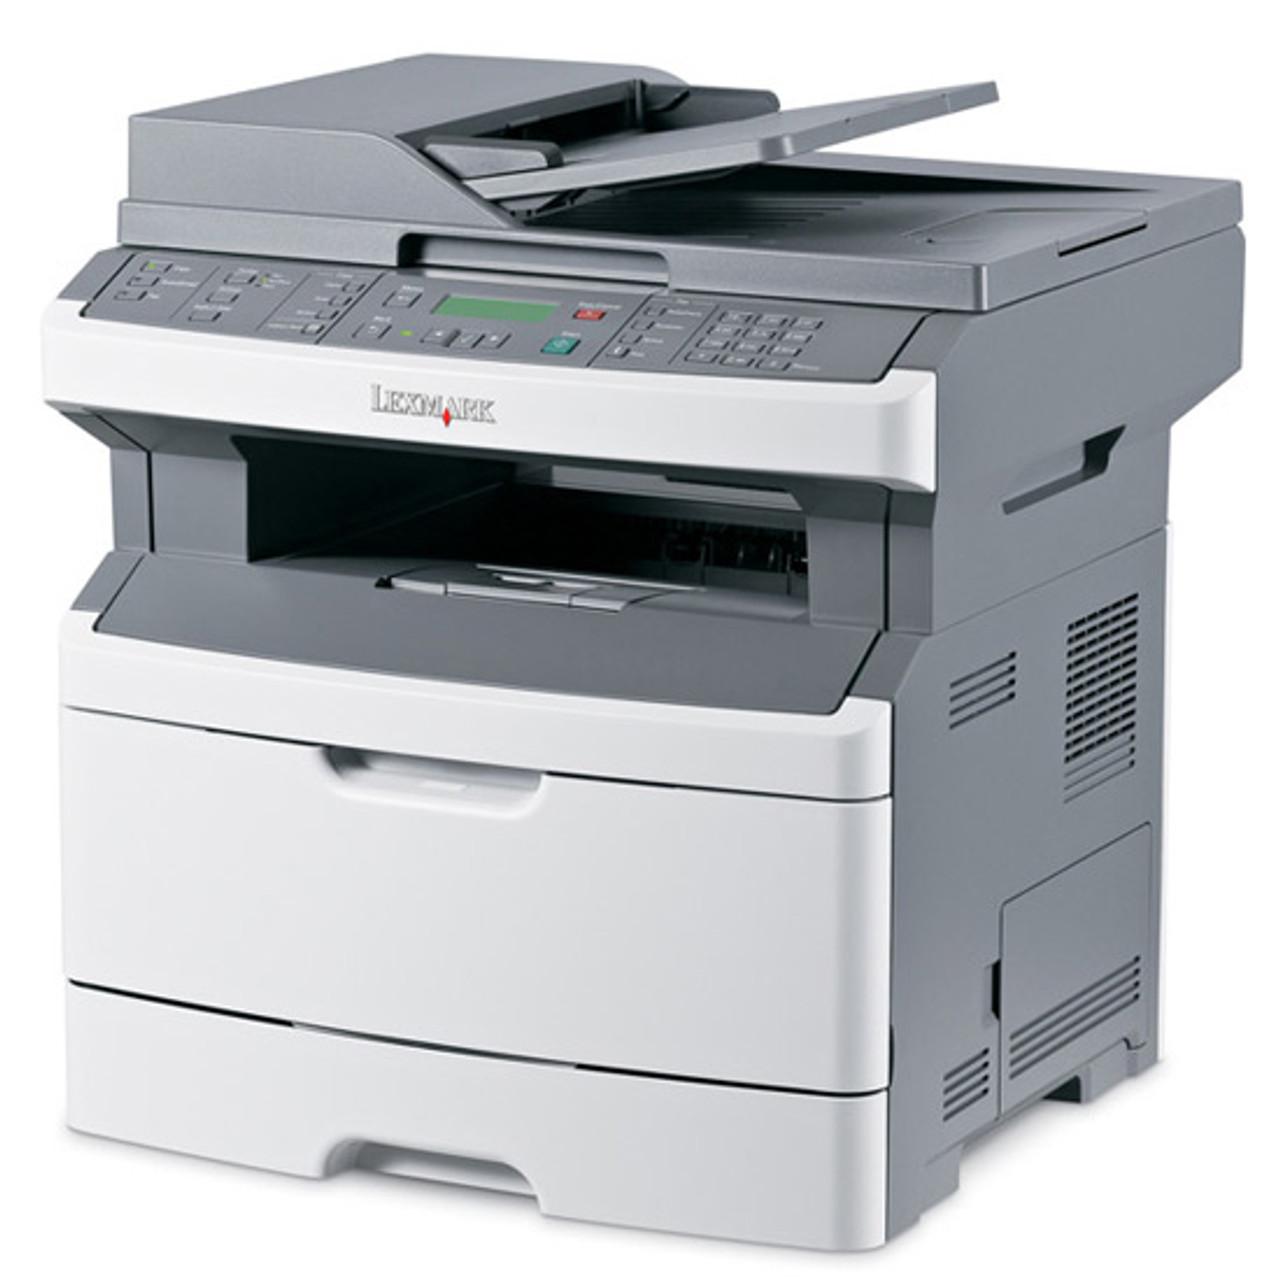 Lexmark x264dn MFP - 13B0500 - Lexmark Laser Printer for sale